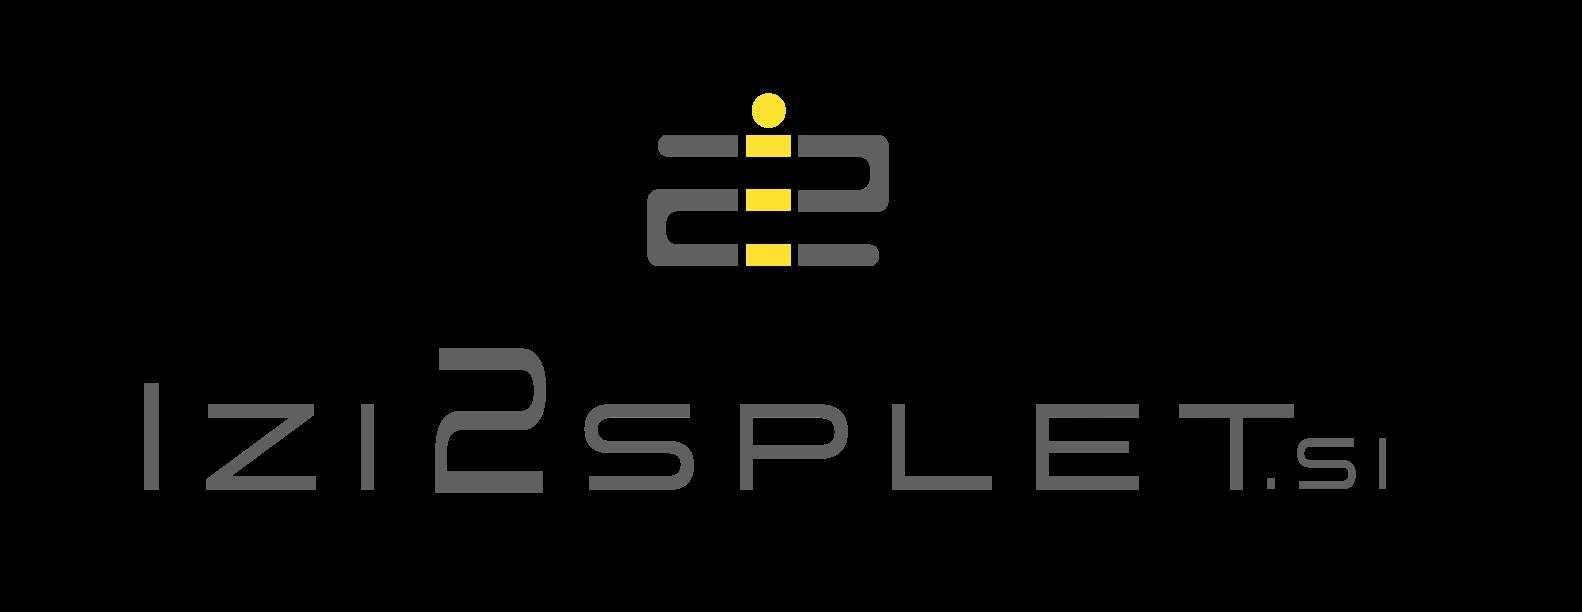 izi2splet logo